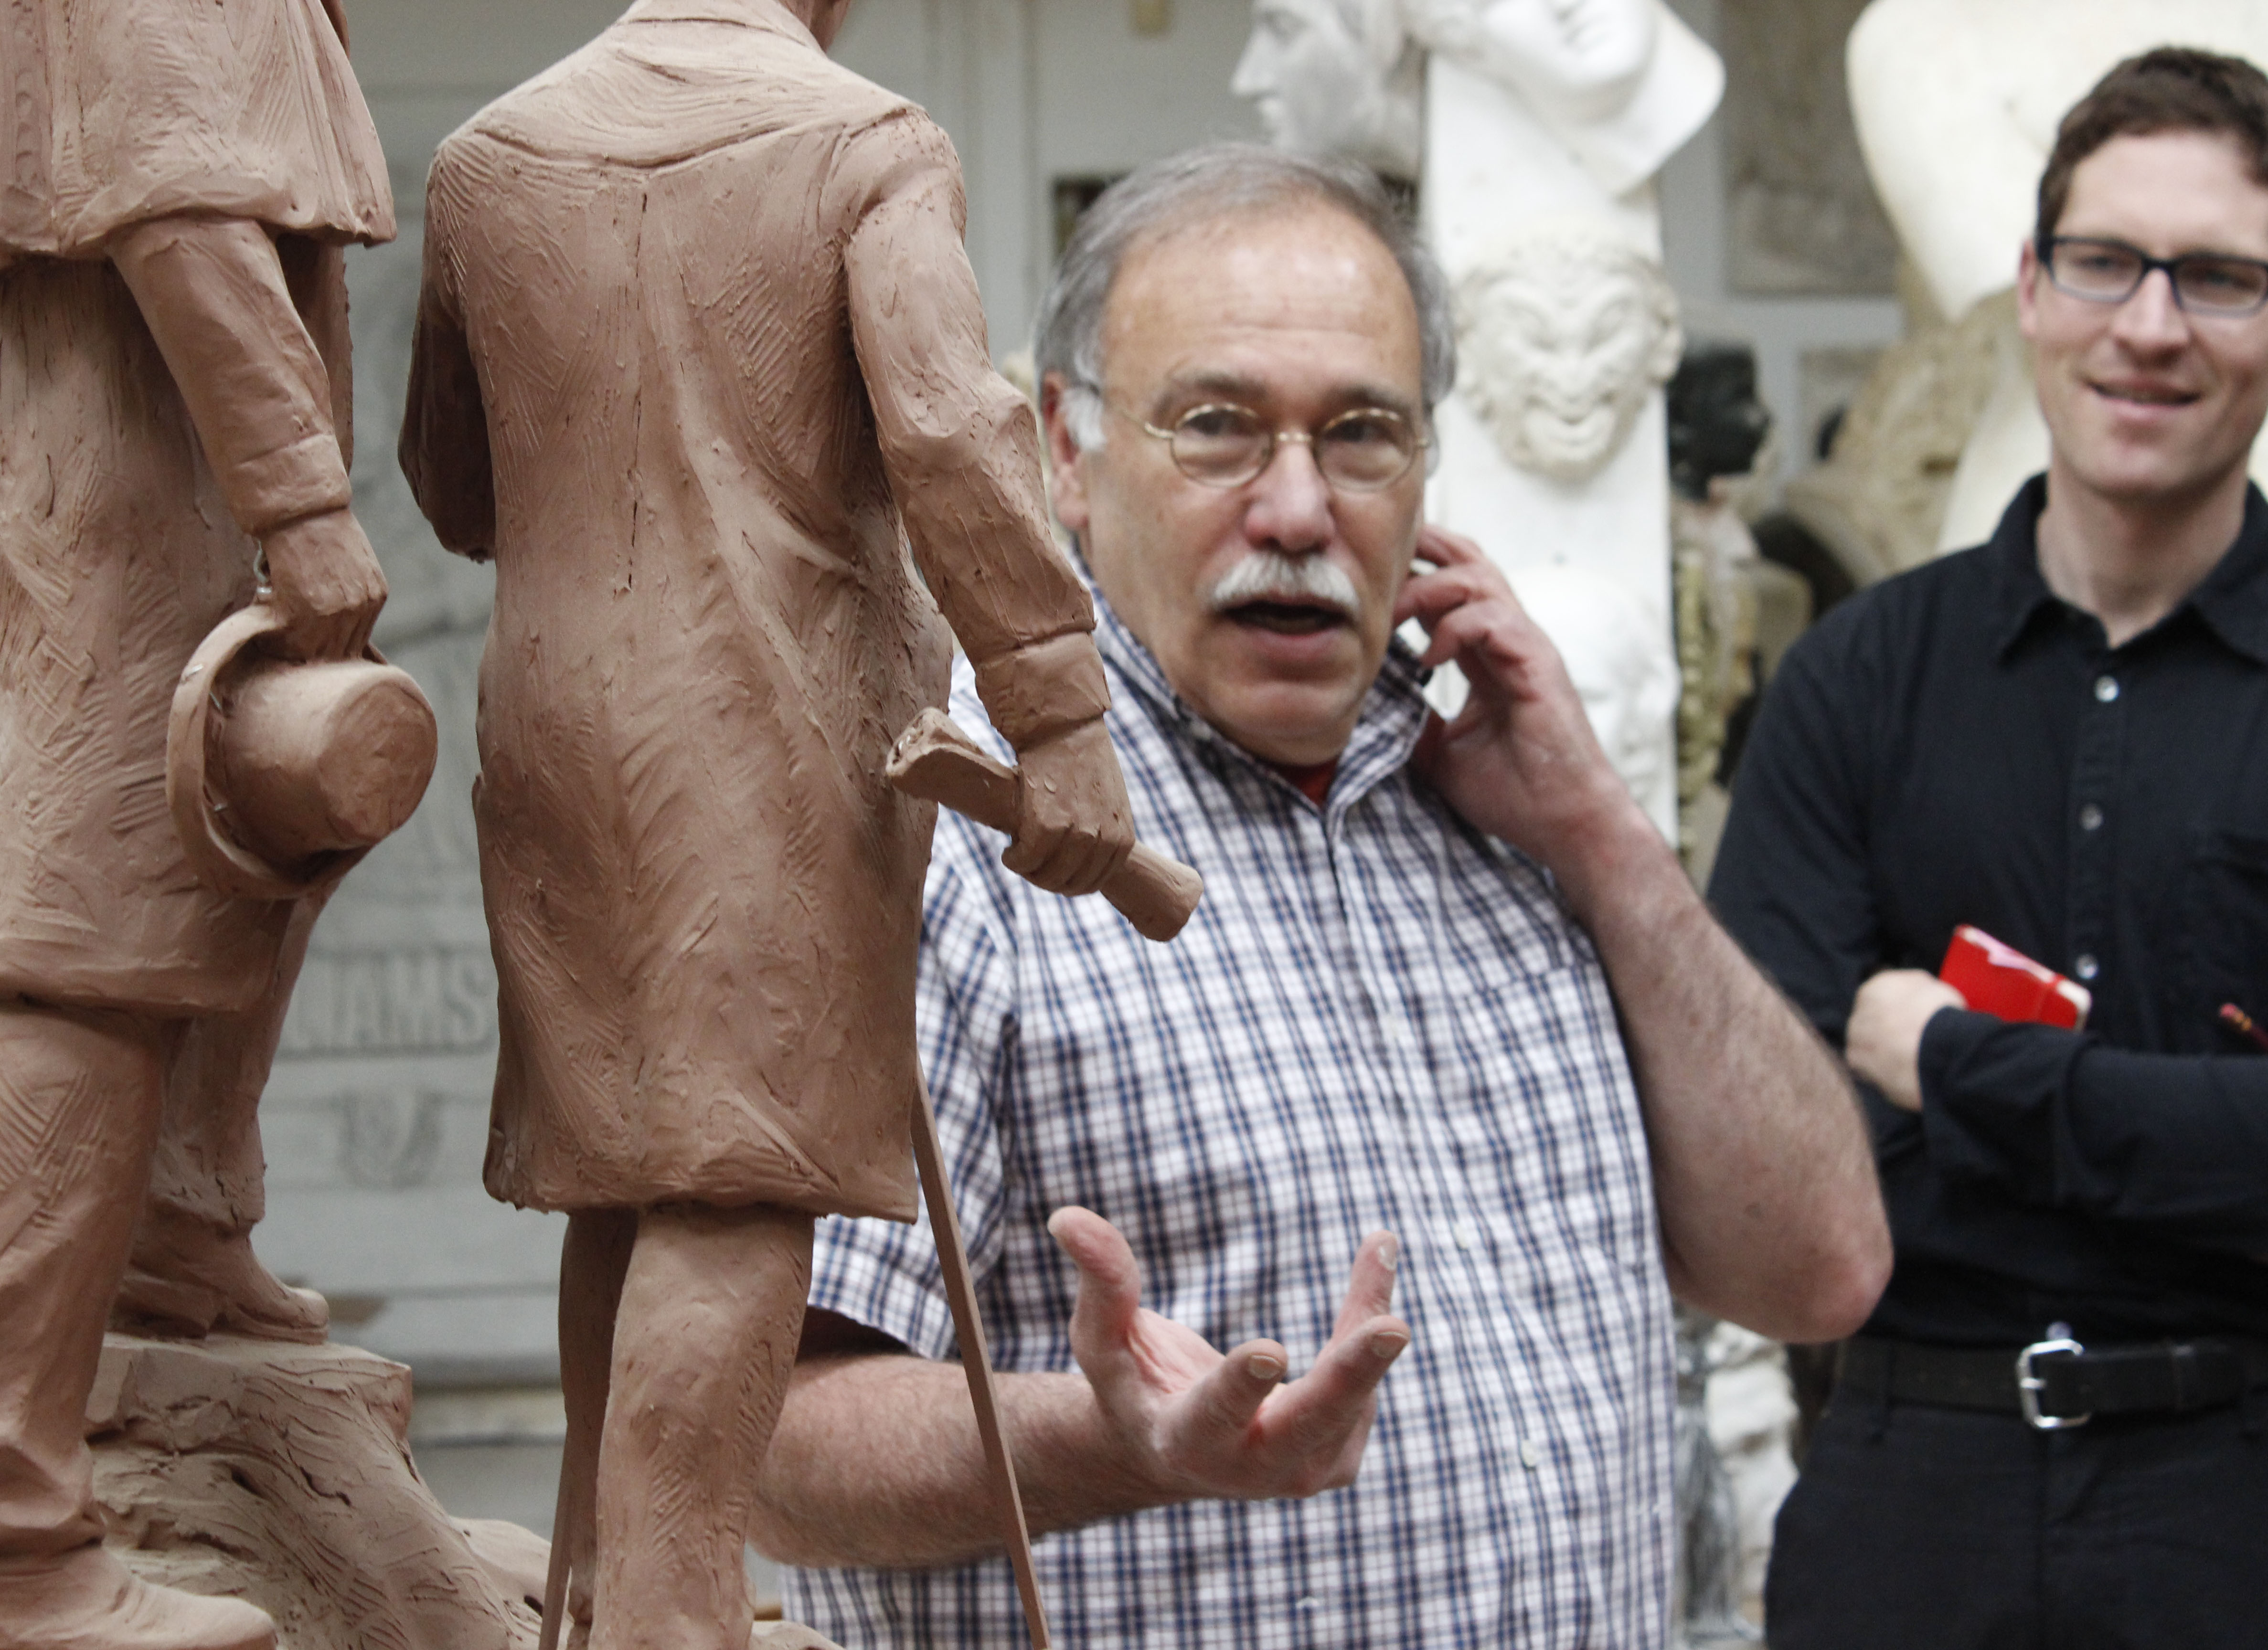 Robert Shure, sculptor and president of Skylight Studios. Photo: Jennifer Novak.